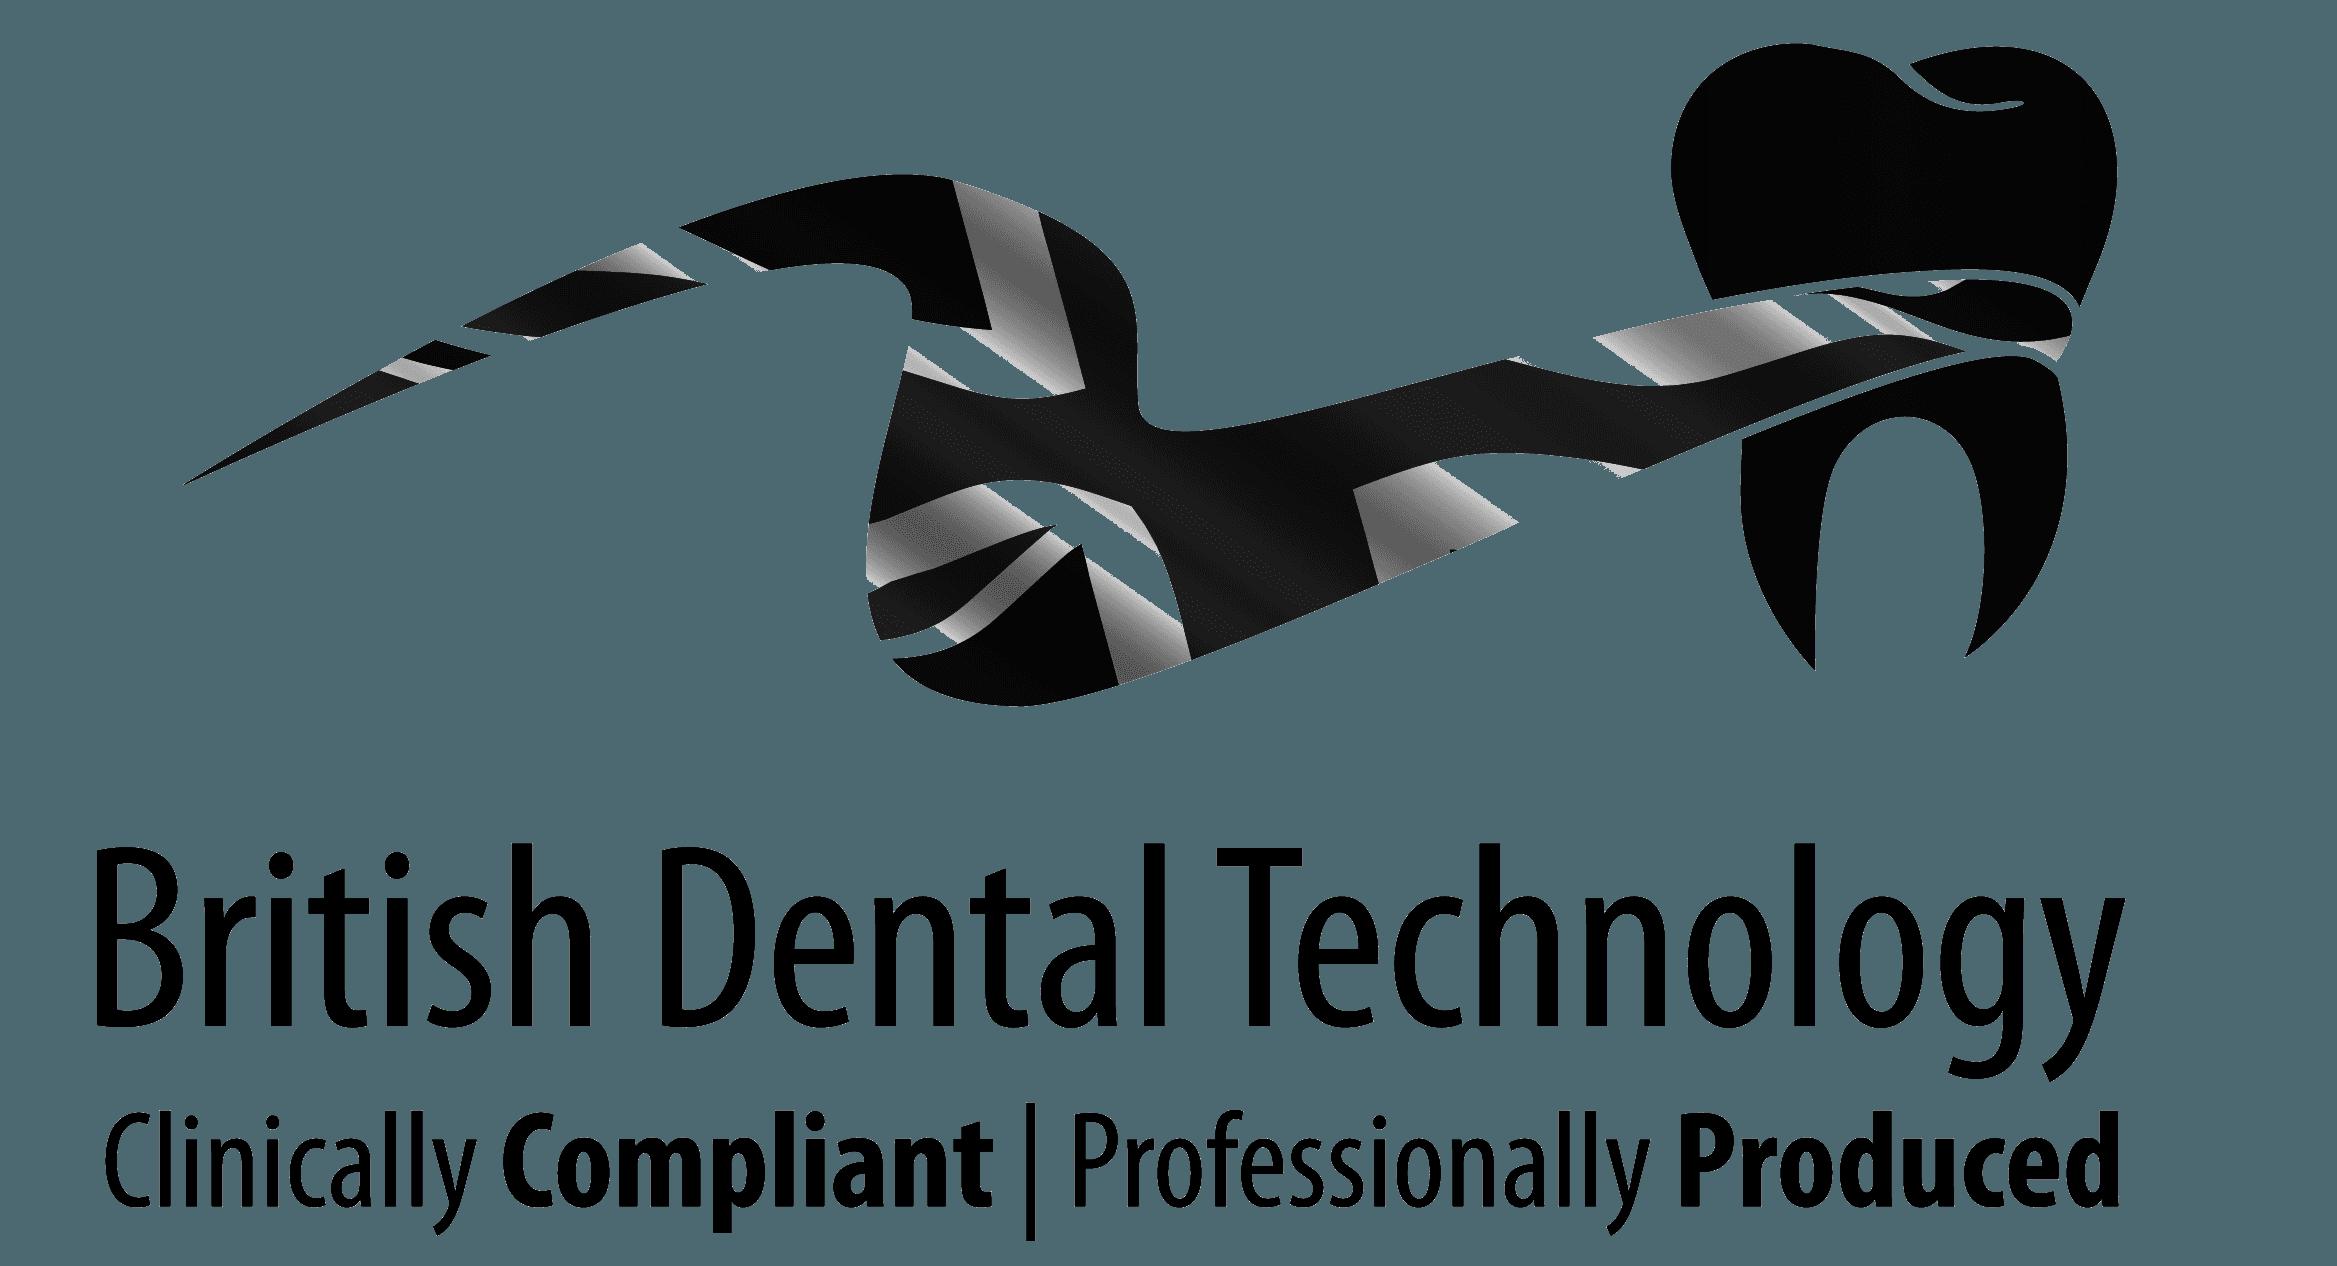 British Dental Technology logo